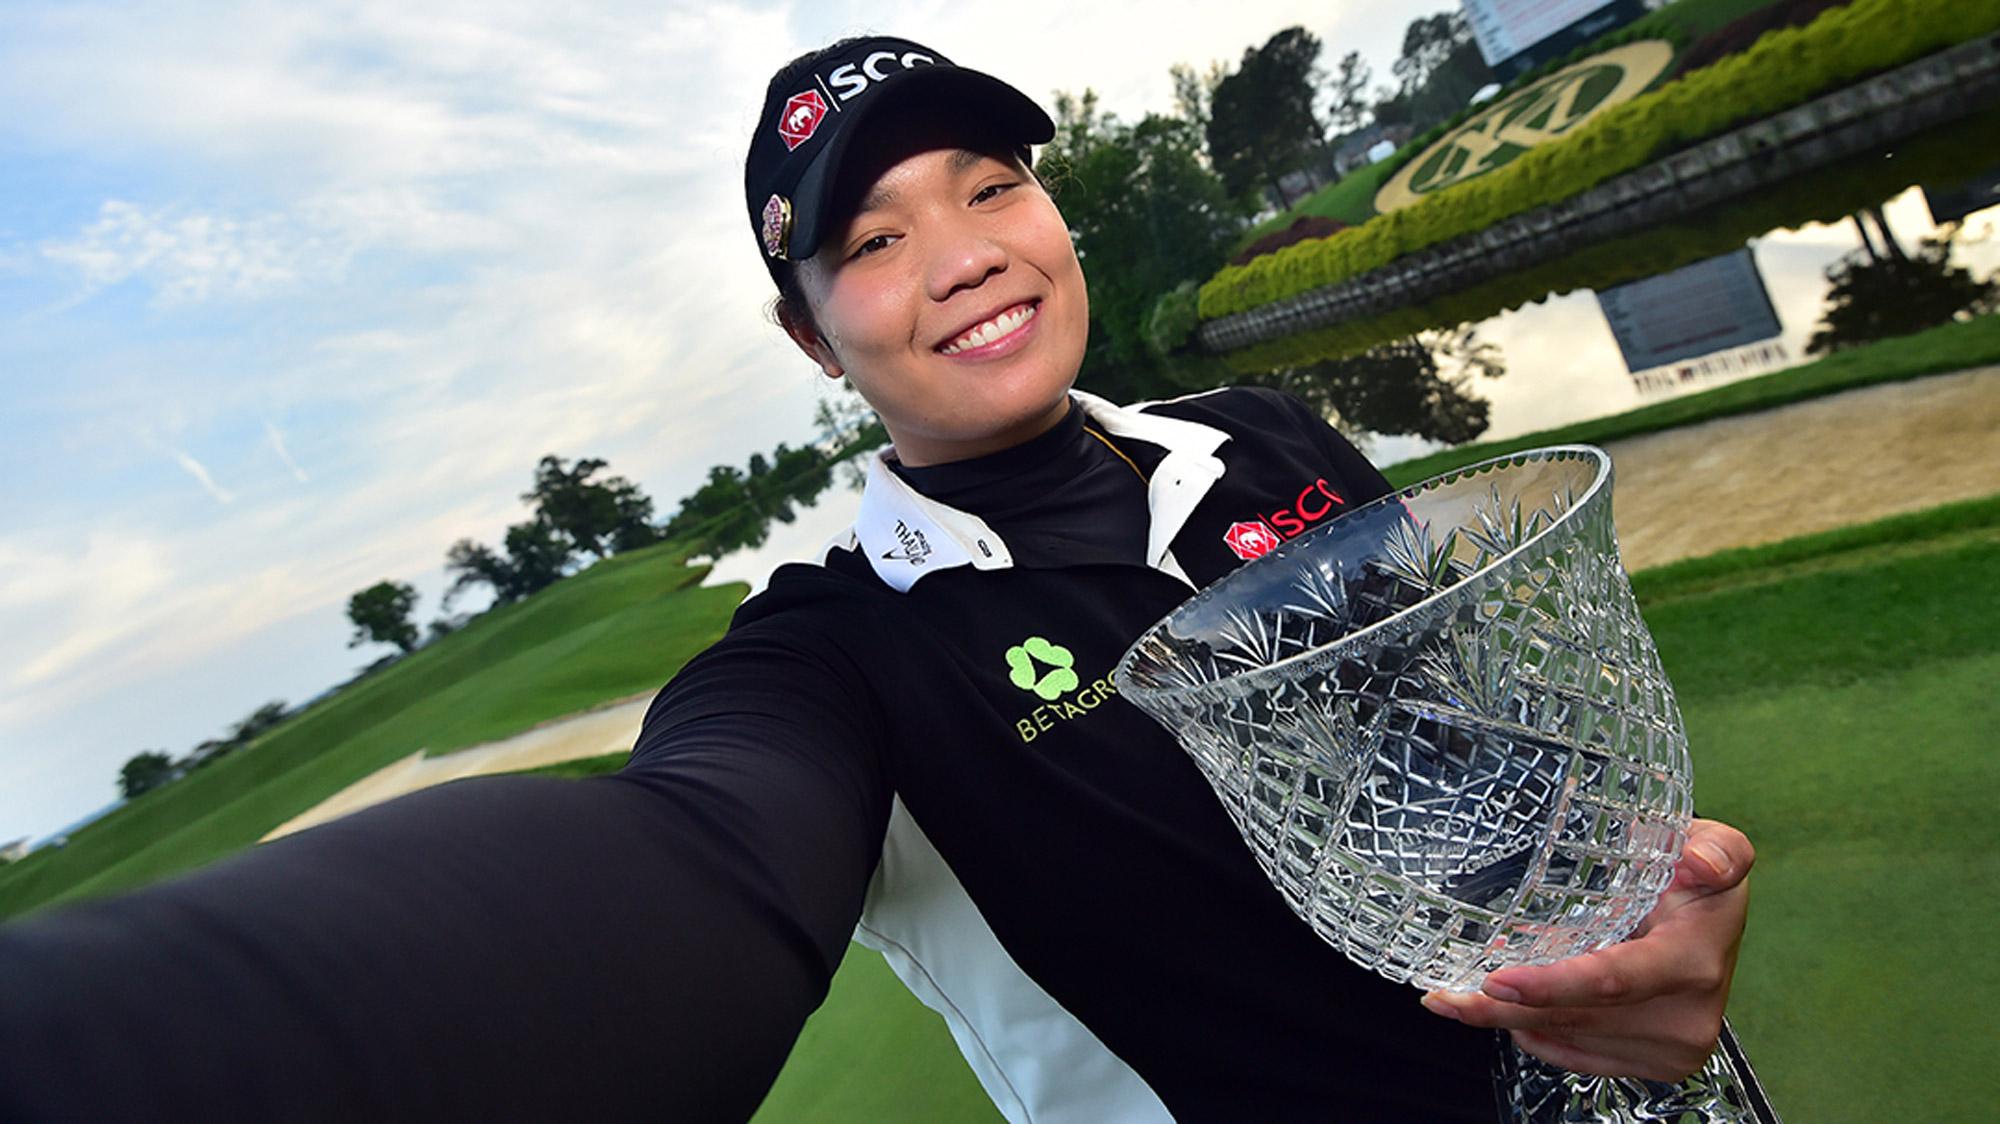 2019 Pure Silk Championship Tuesday Pre-Tournament Notes and Interviews | LPGA | Ladies Professional Golf Association